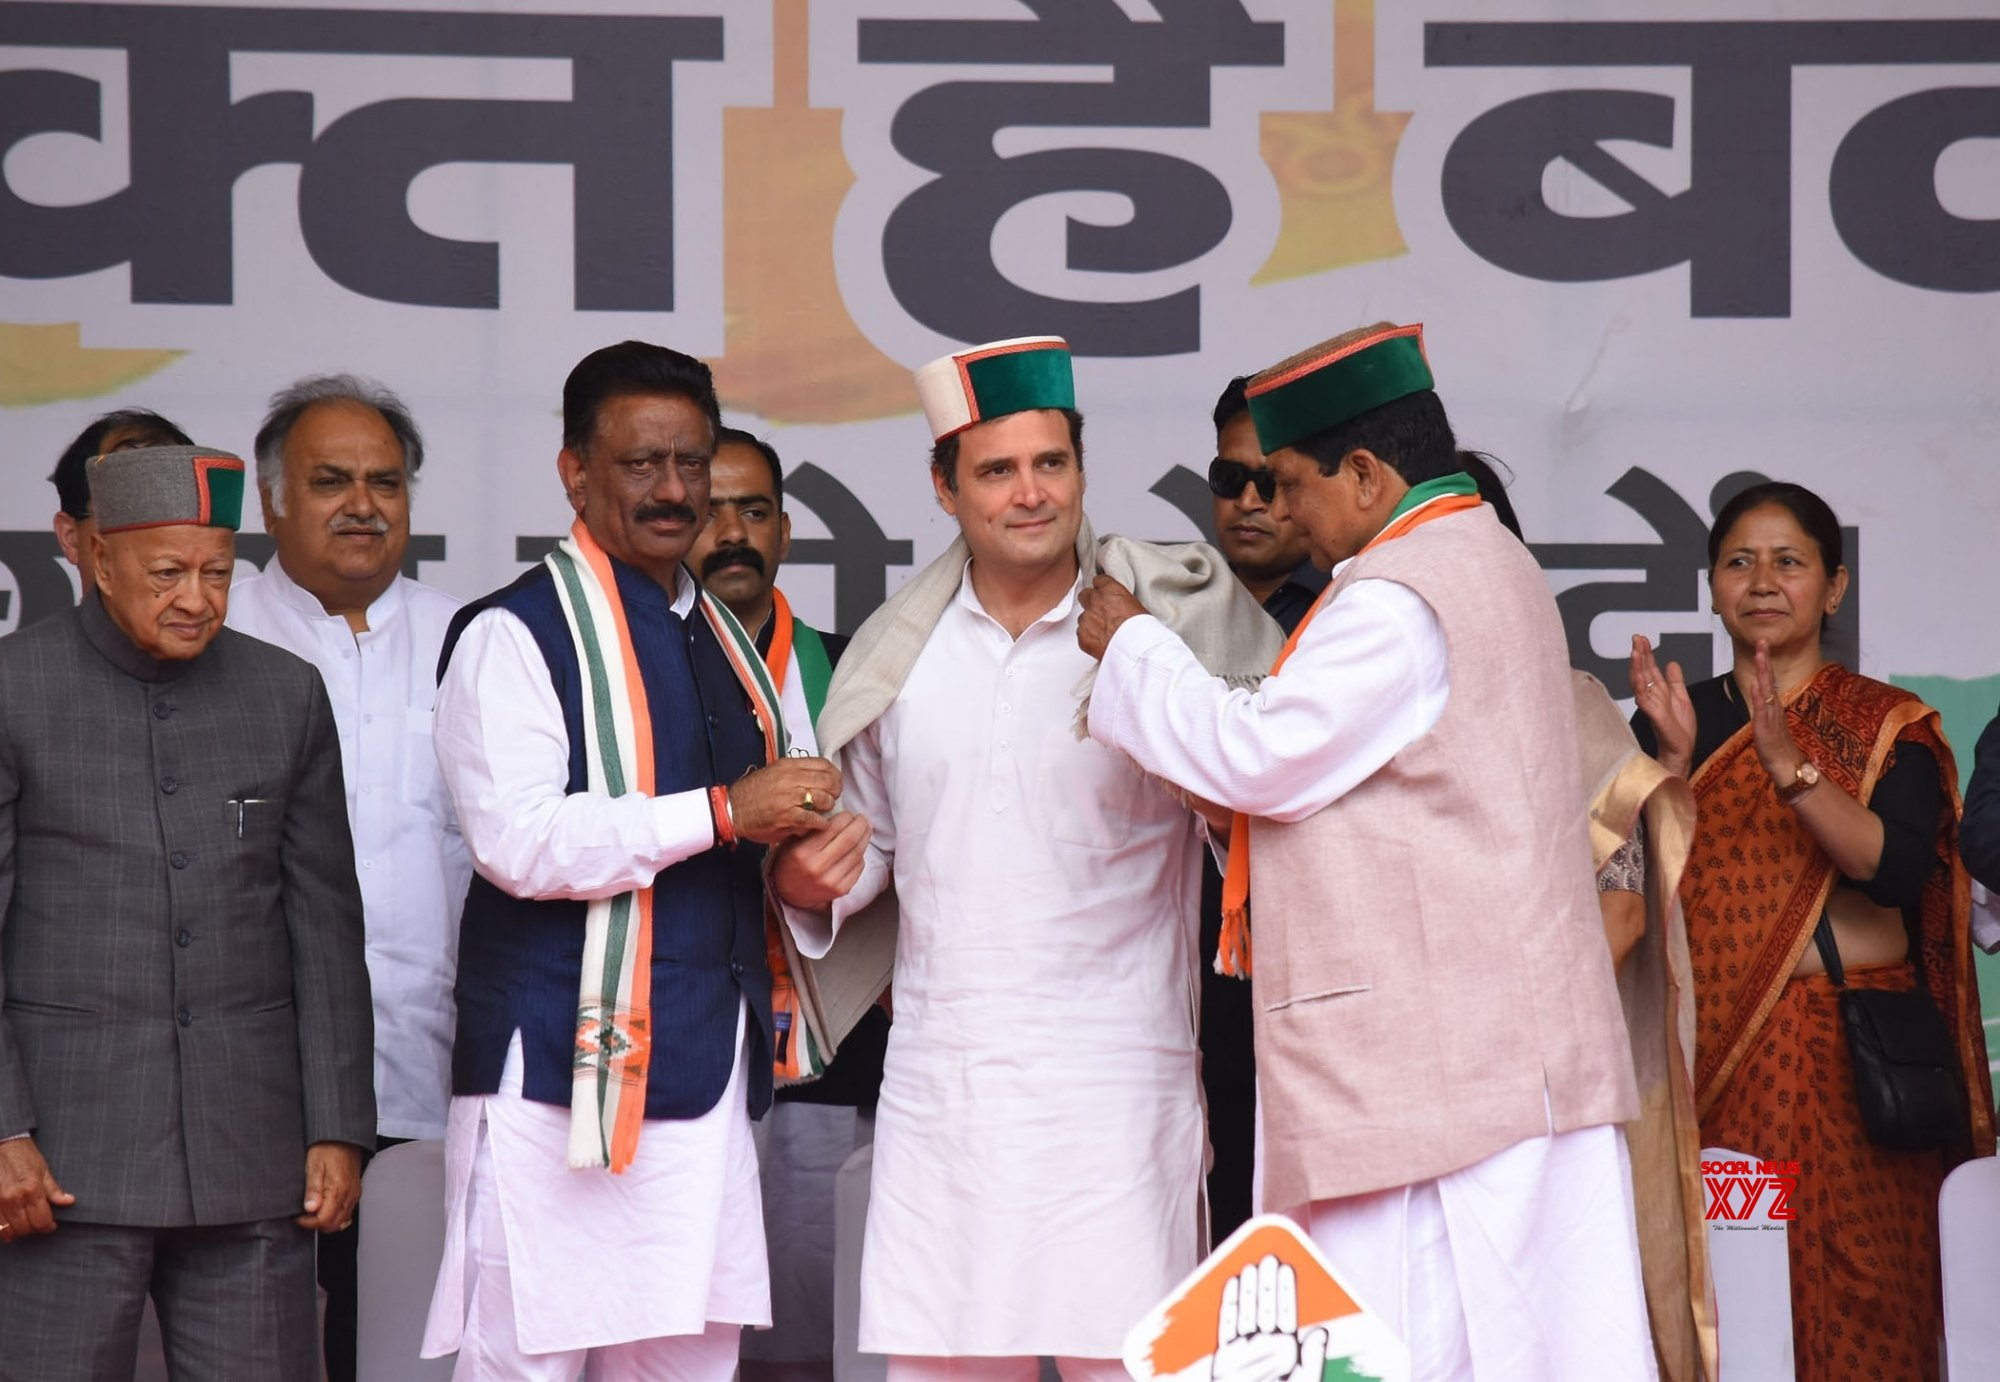 Solan: 2019 Lok Sabha elections - Rahul Gandhi at a public rally in Himachal Pradesh (Batch - 2) #Gallery